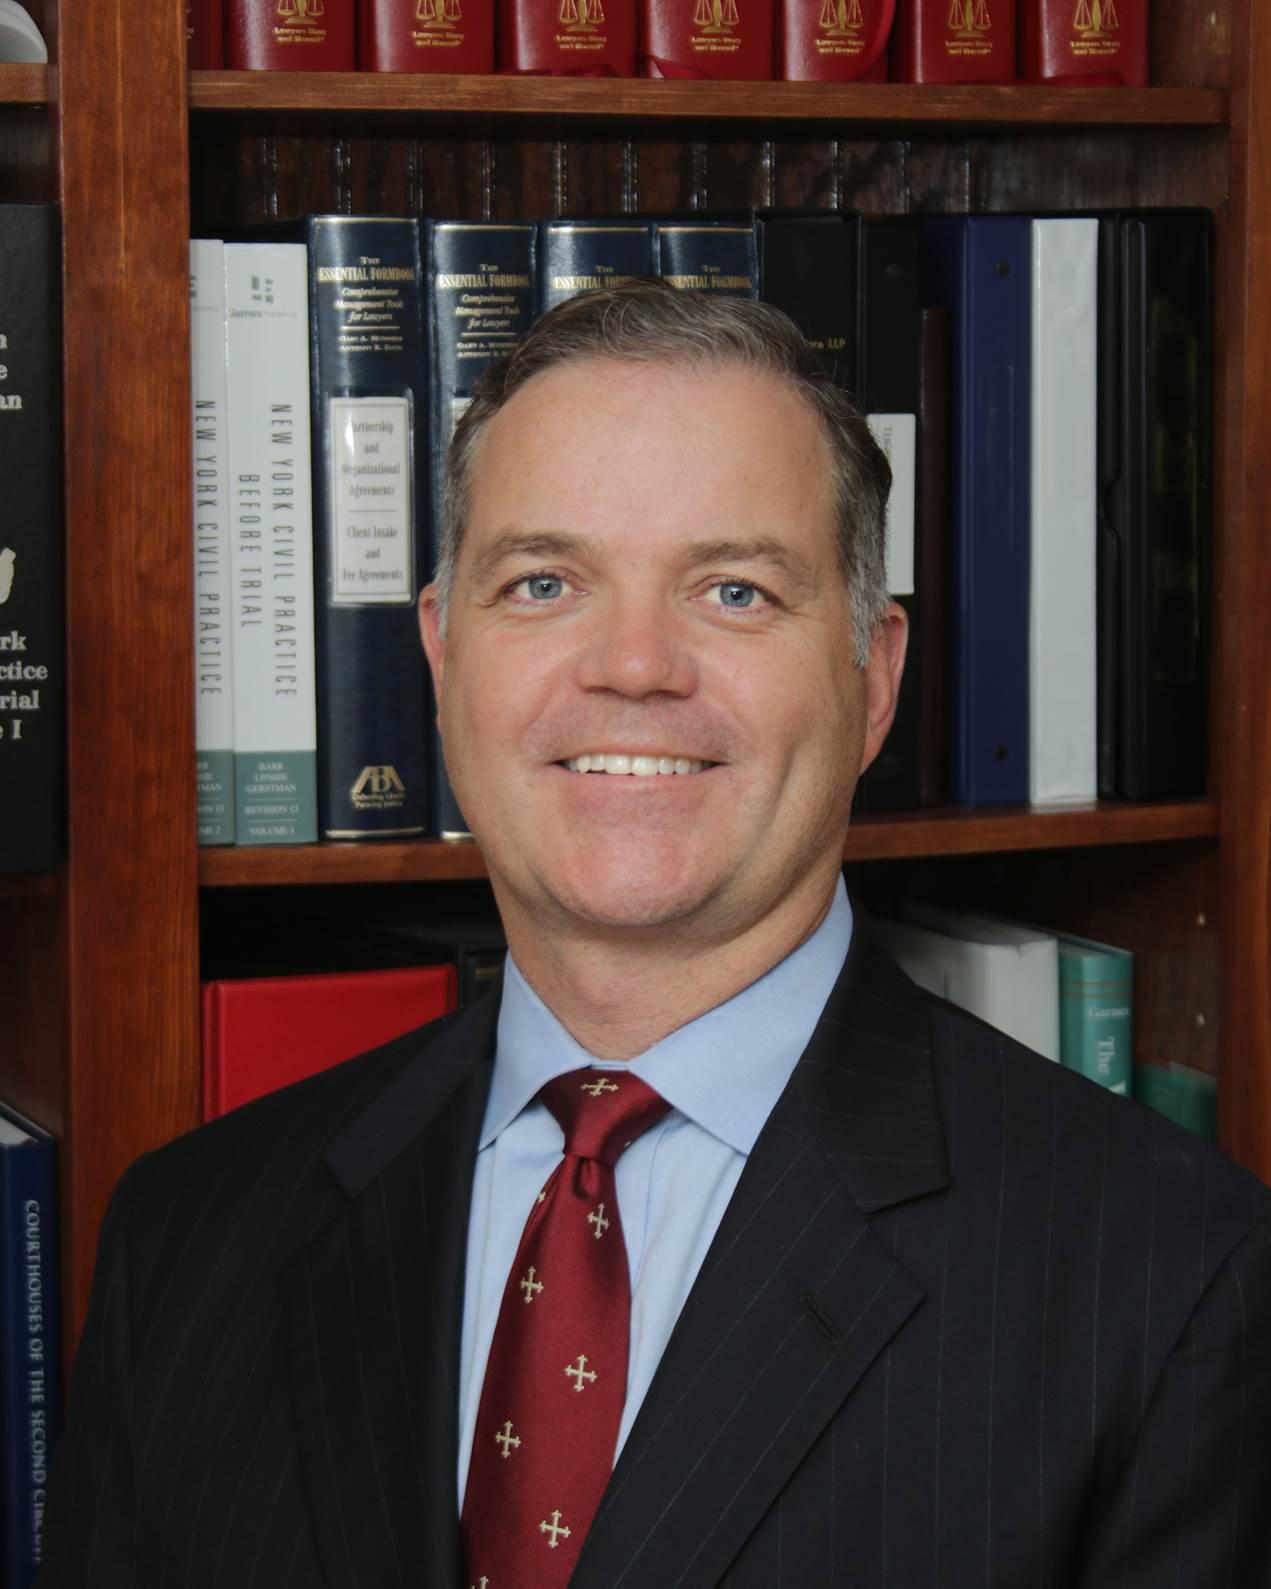 Councilman_Edmund_J.M._Smyth.jpg